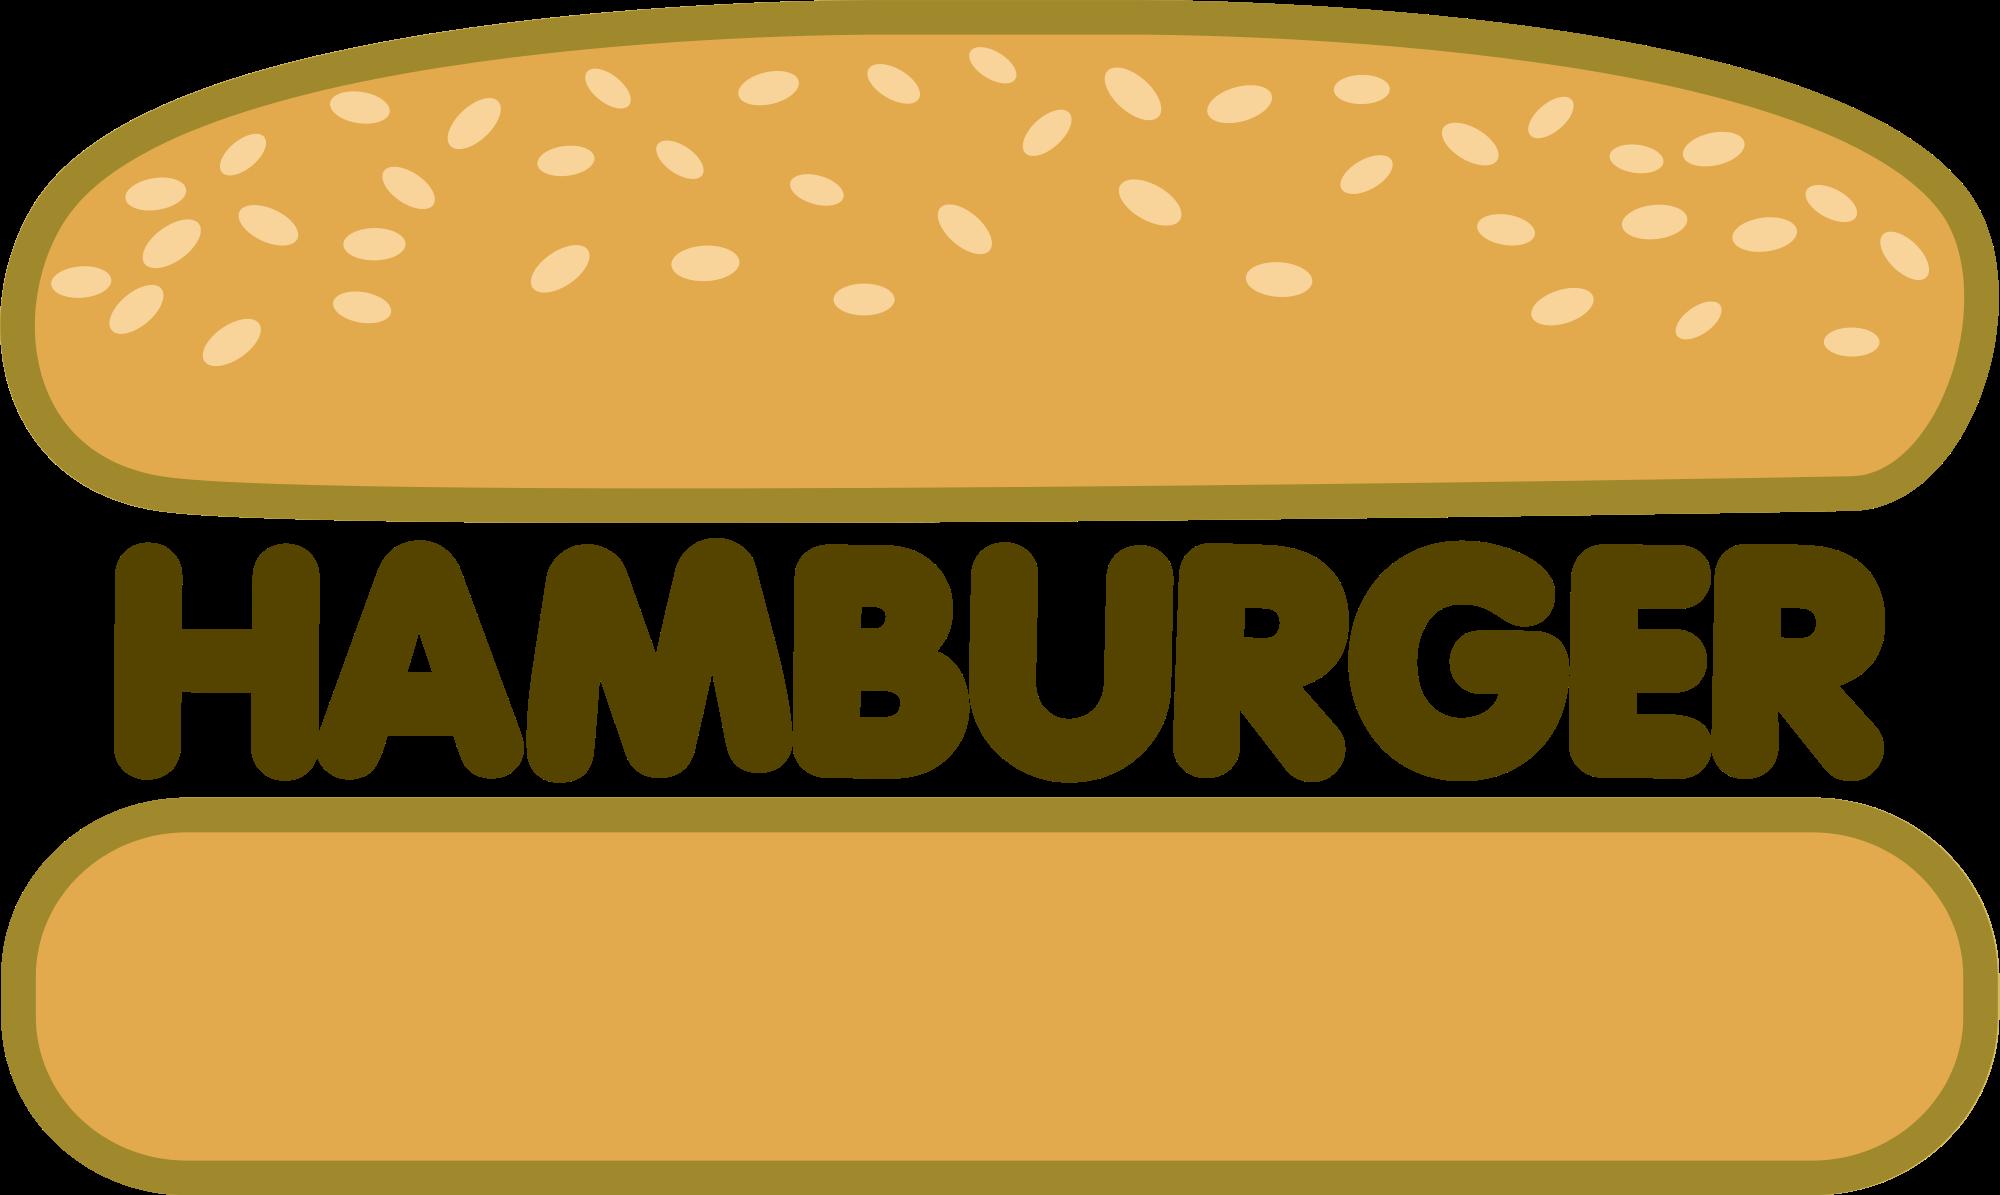 Hamburger clipart svg. File wikimedia commons open